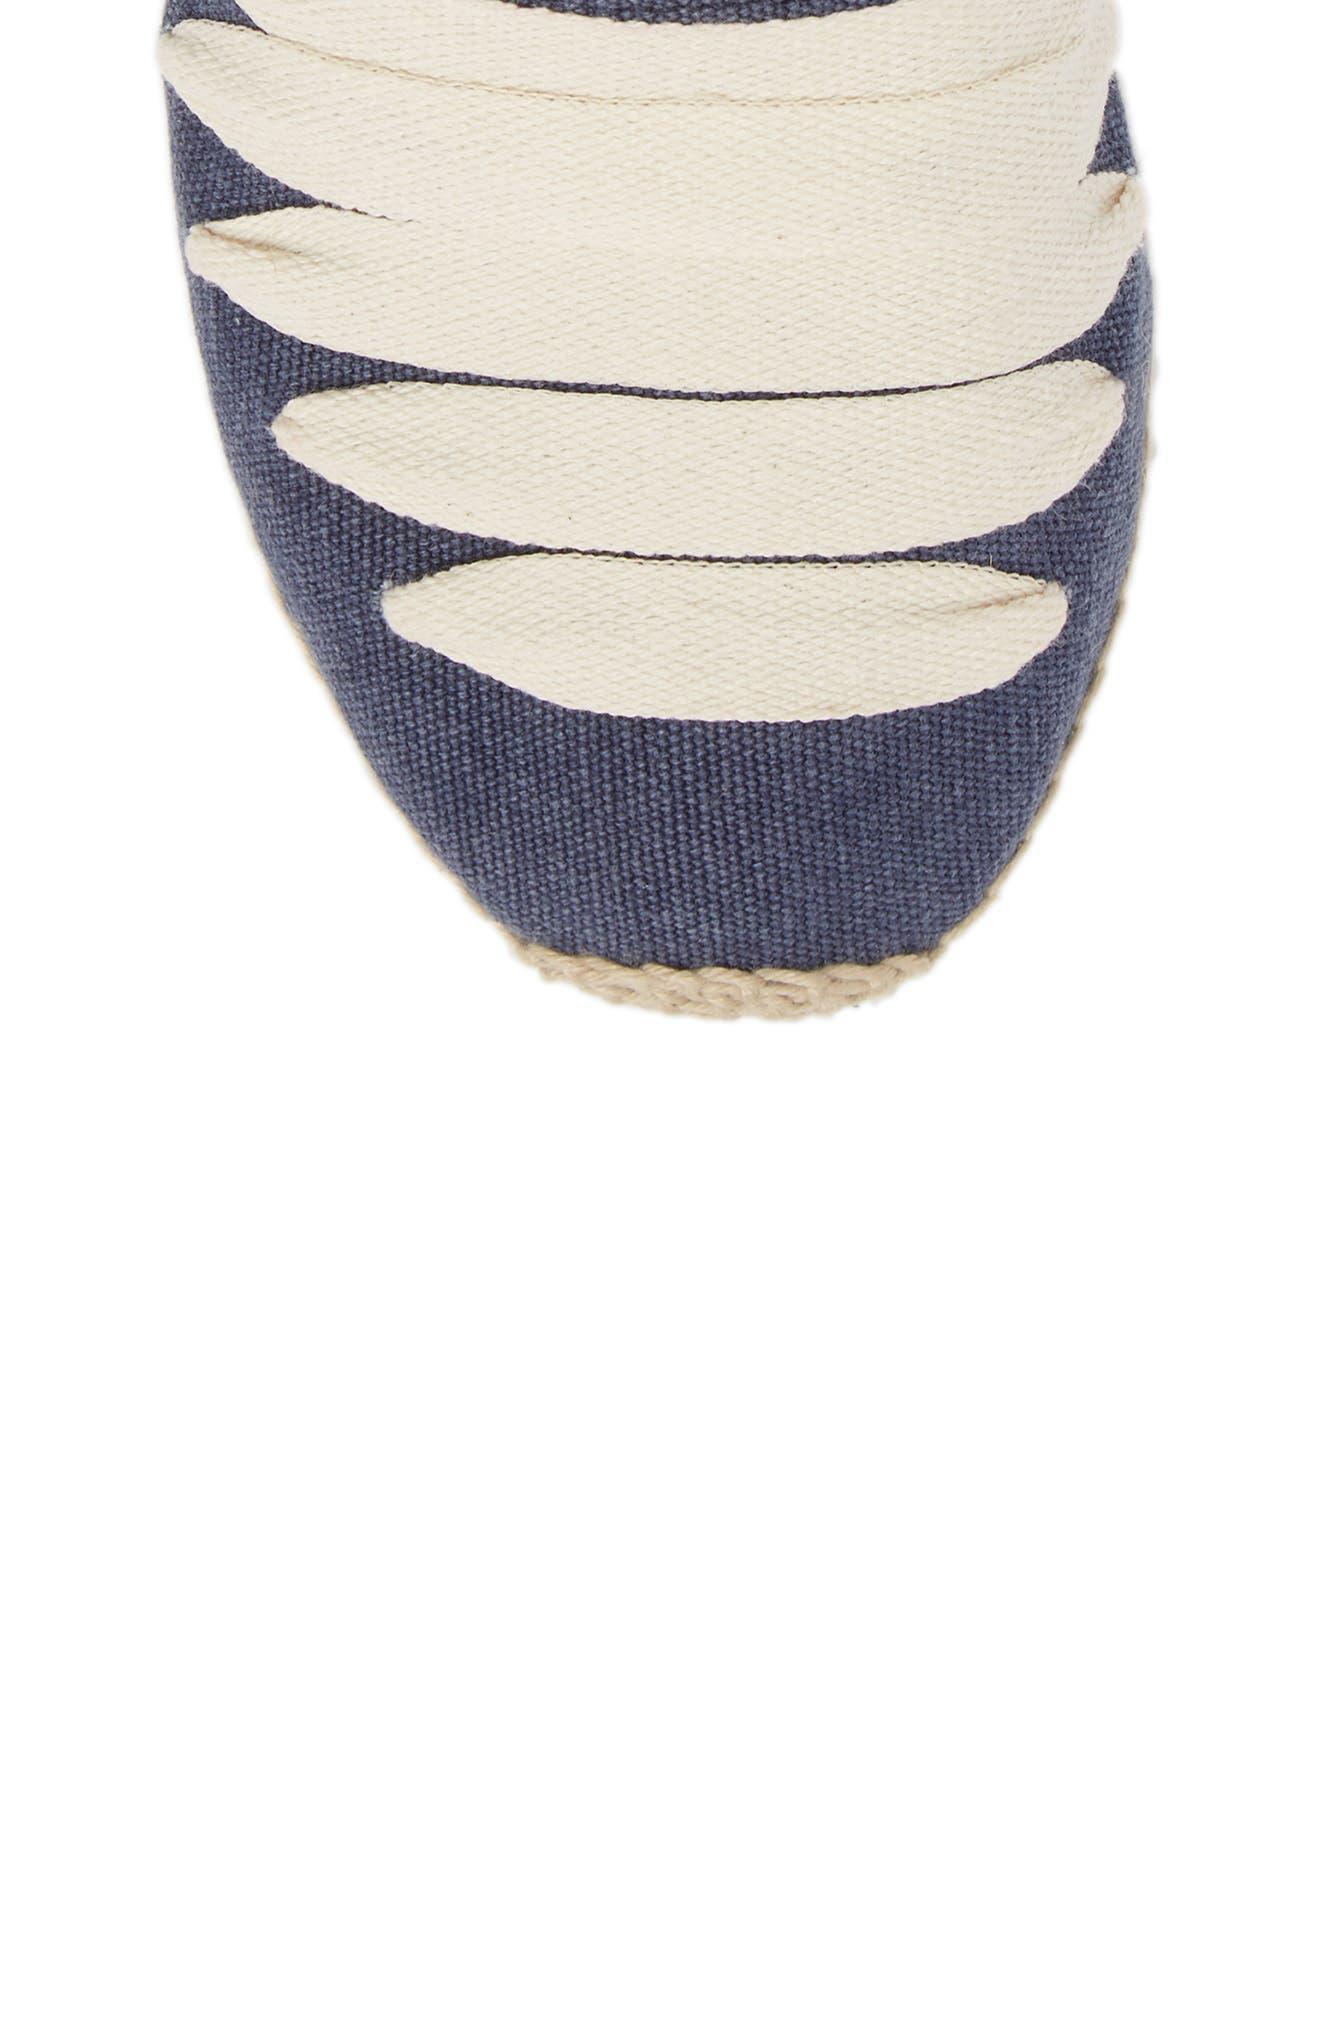 Gavet Wraparound Espadrille,                             Alternate thumbnail 5, color,                             Blue/ Ecru Fabric